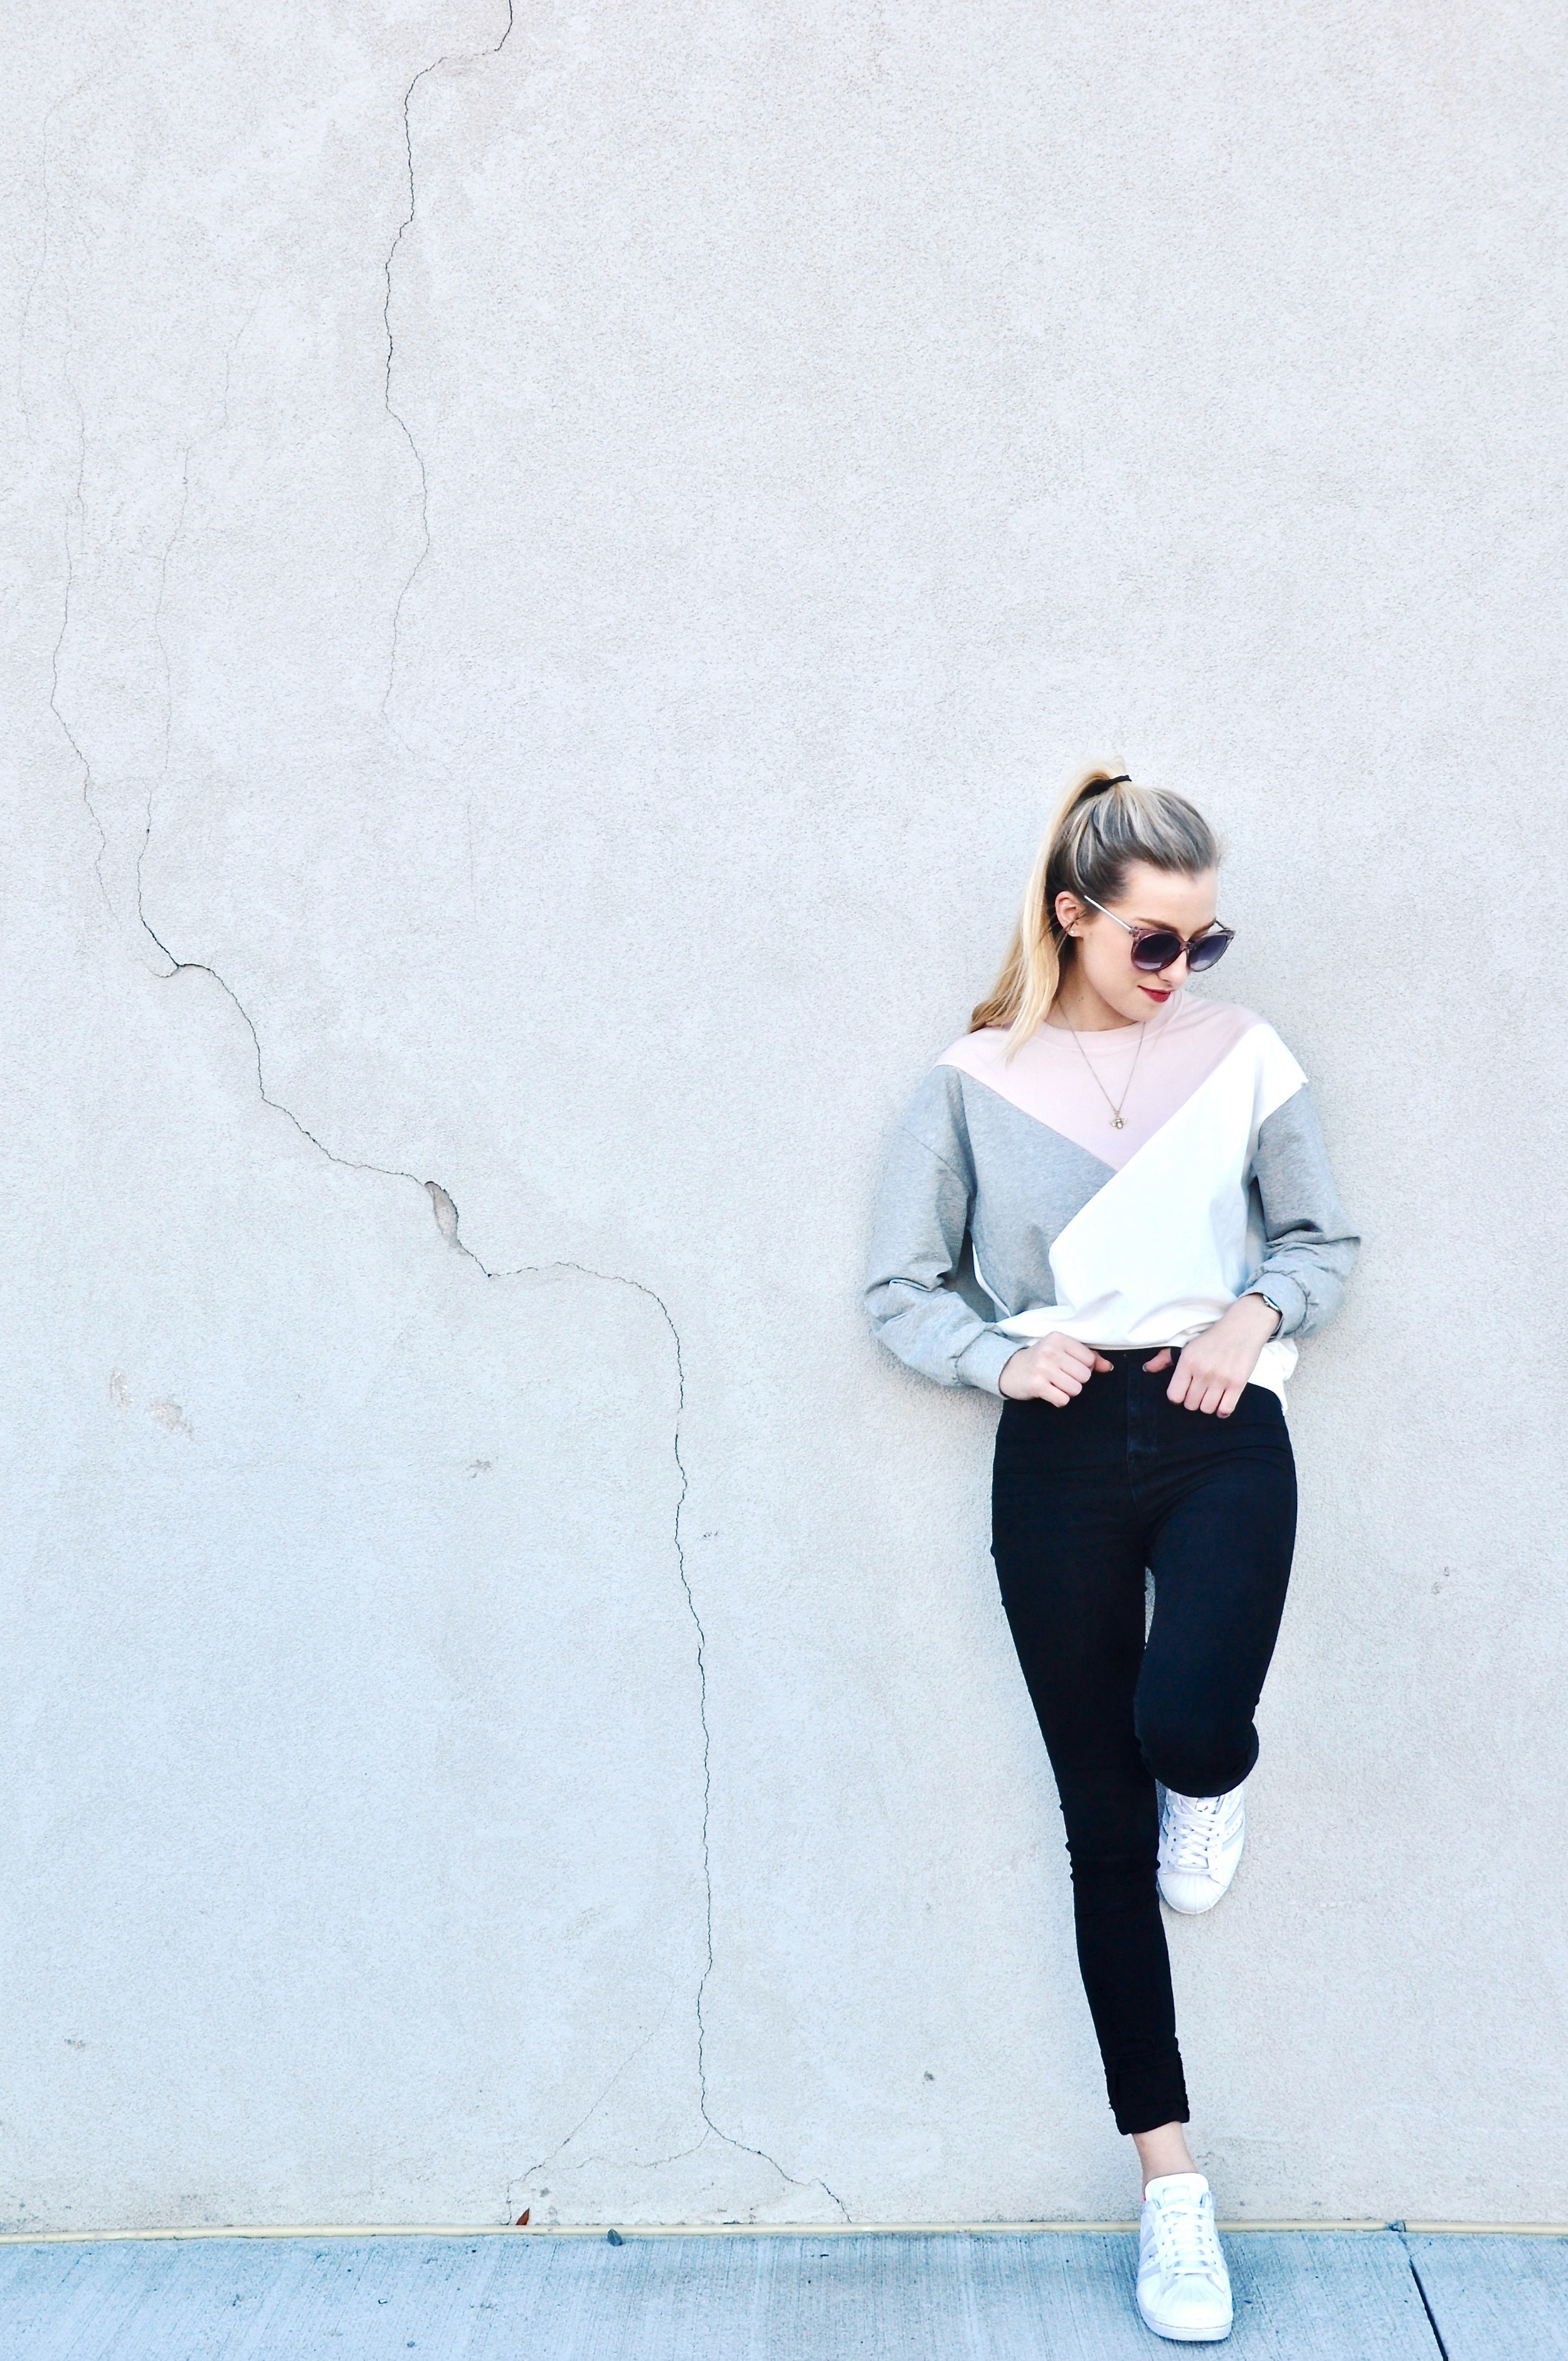 Sweatshirt:  Romwe , Watch: Mockberg,Sunglasses: Ann Taylor, Jeans: BDG Urban Outfitters, Shoes: Adidas Custom Superstars